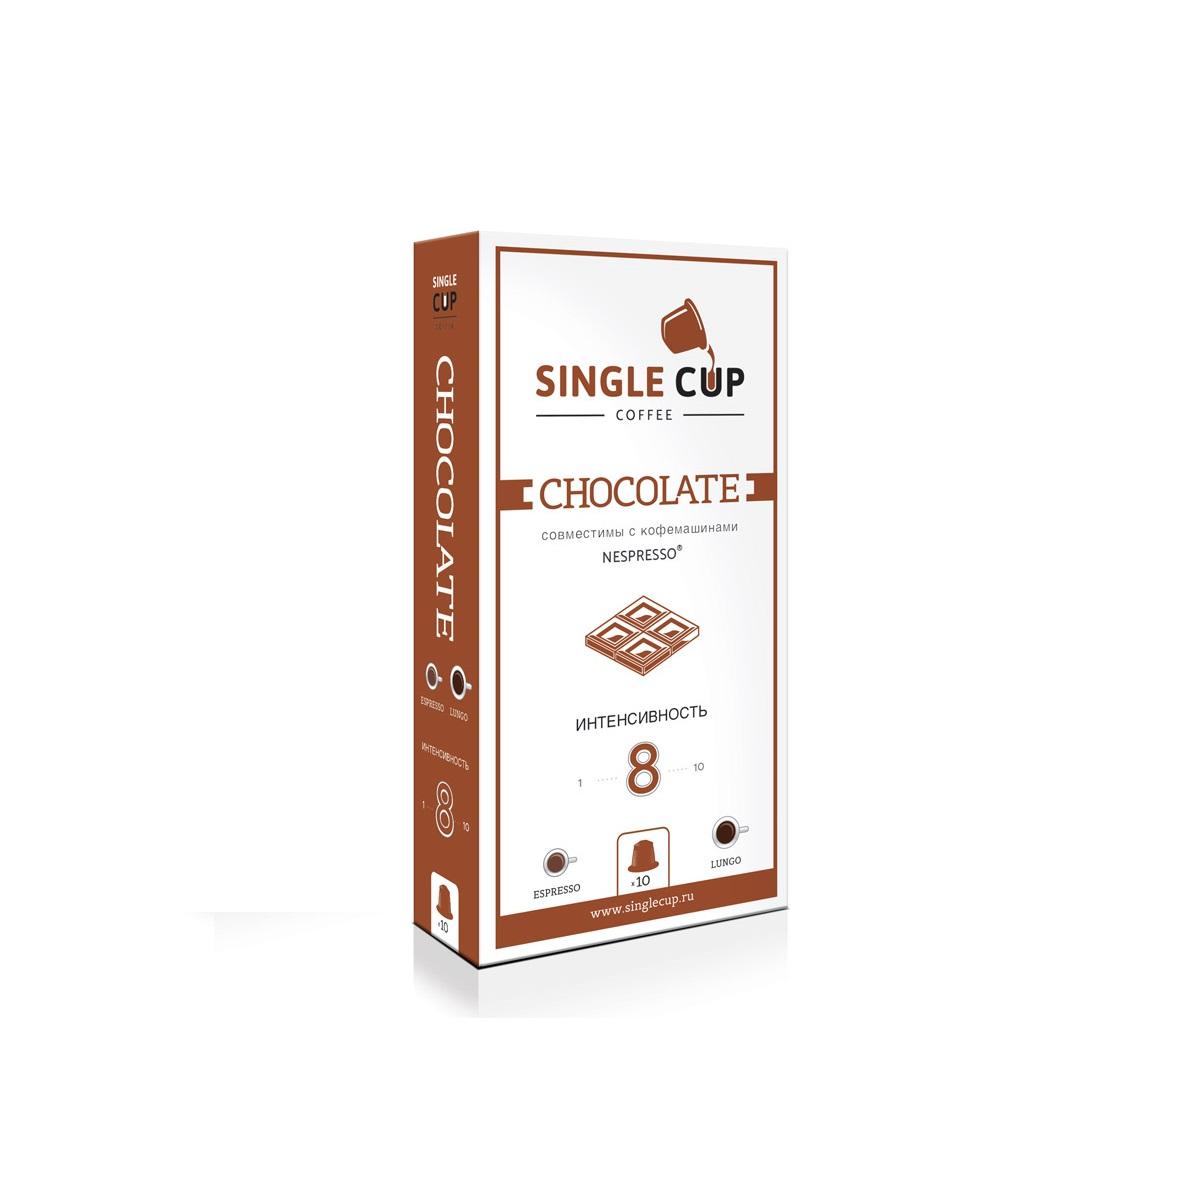 Кофе в капсулах Single Cup Coffee Chocolate, 55 г блюз эспрессо форте кофе молотый в капсулах 55 г